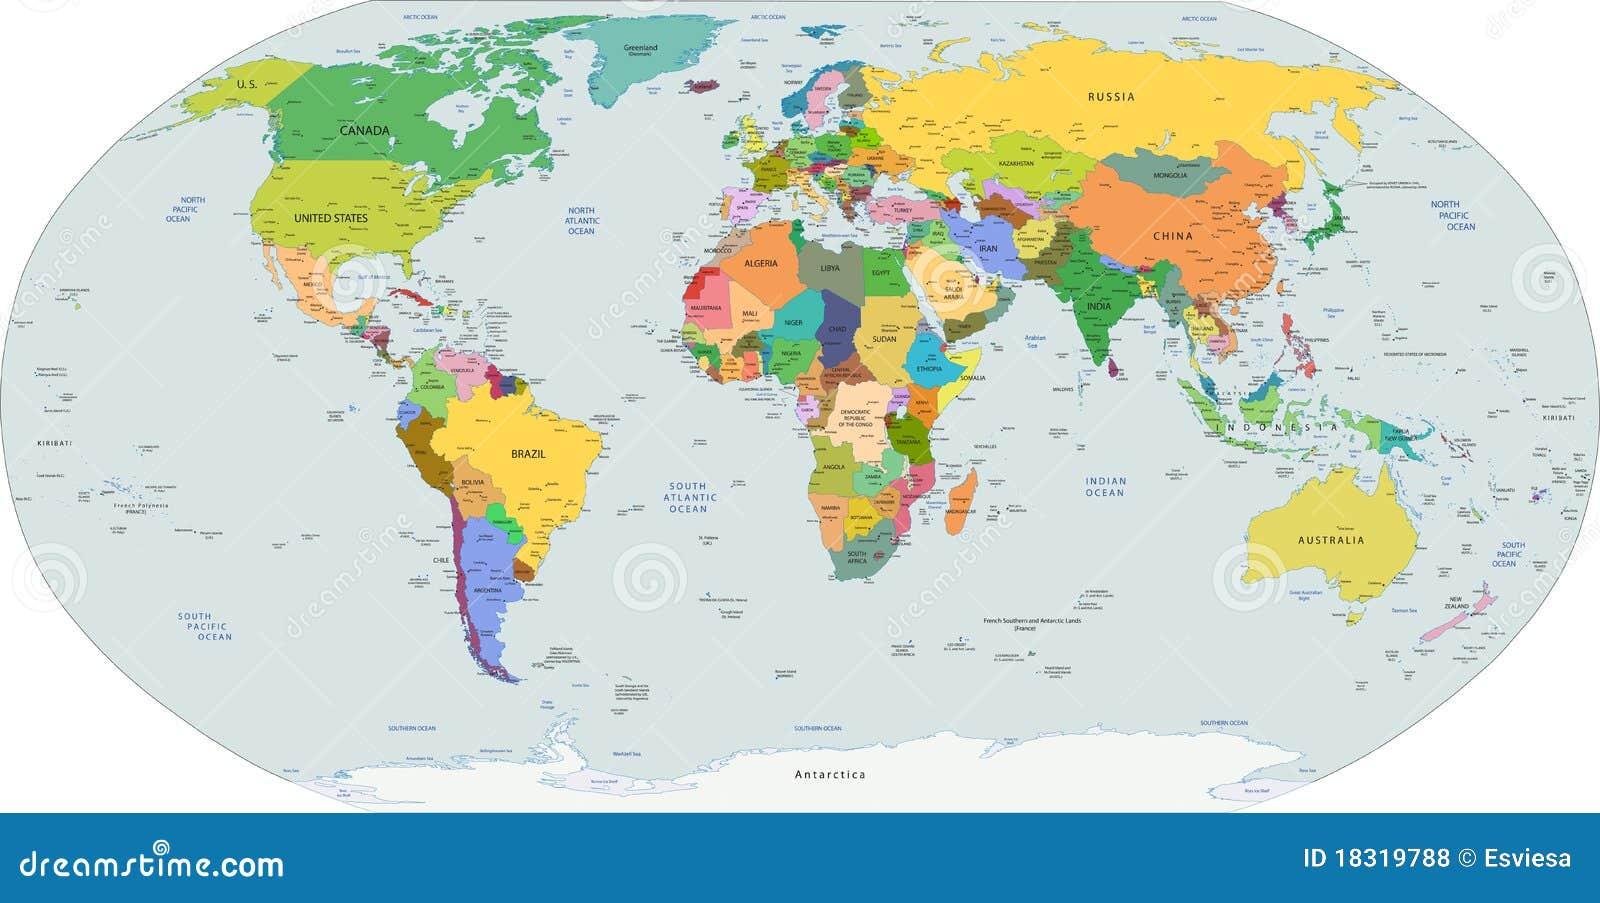 Globale Politische Karte Der Welt Vektor Vektor Abbildung